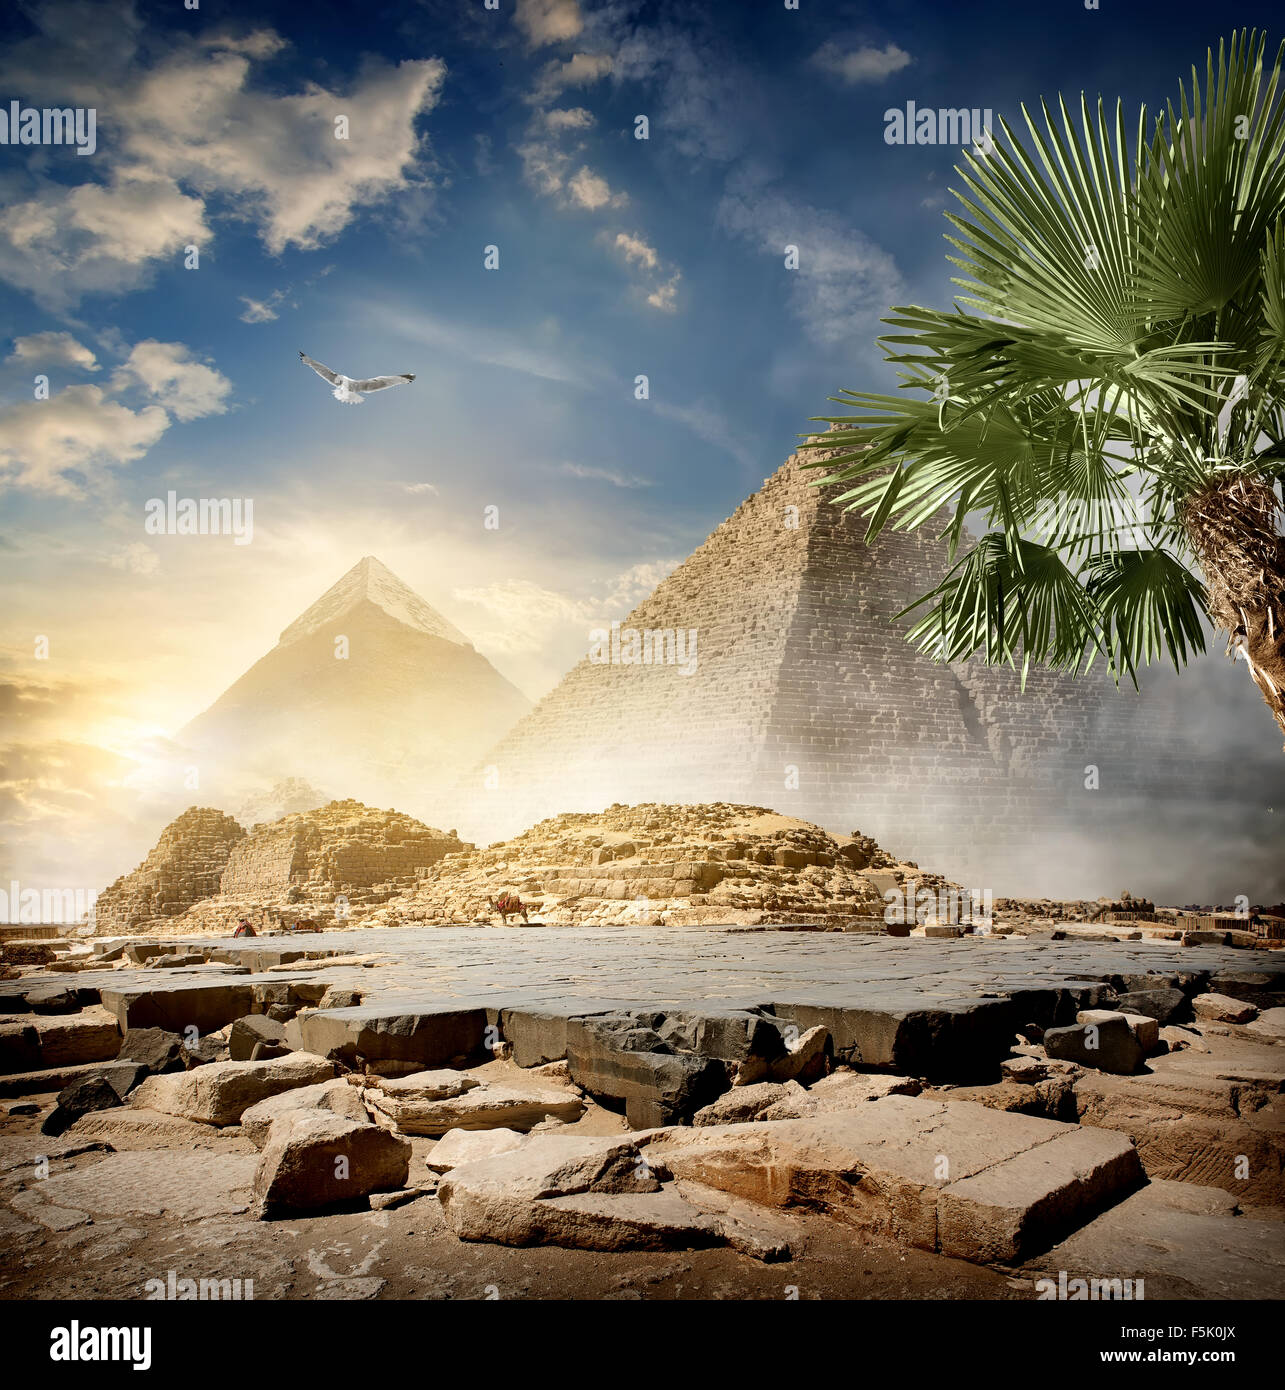 Fog around pyramids in desert at sunrise - Stock Image